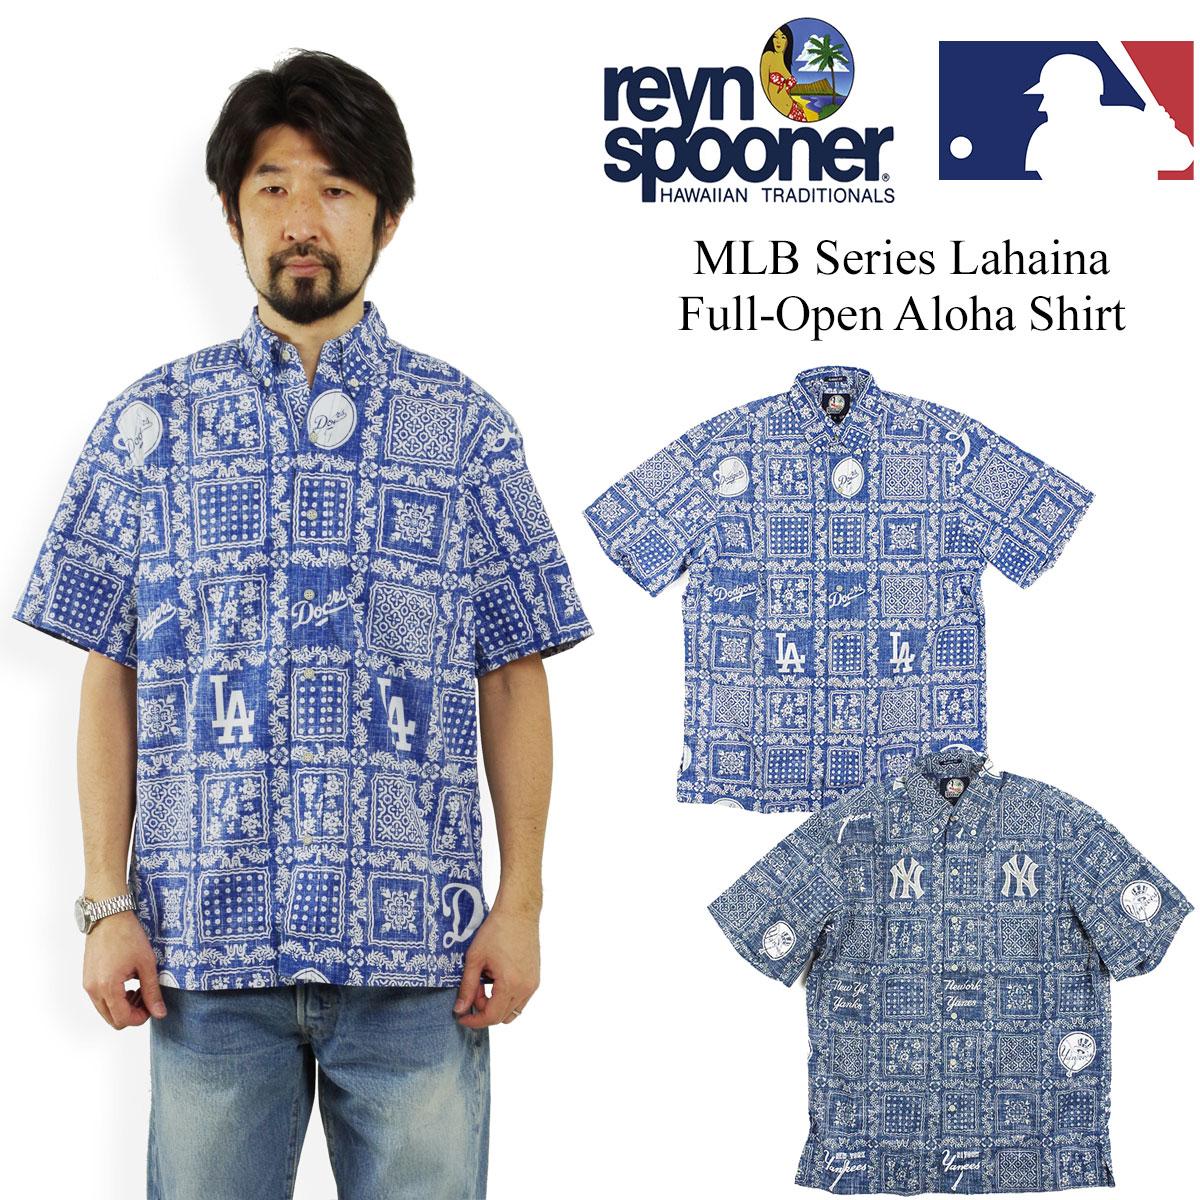 372253ec レインスプーナー REYN SPOONER short sleeves Hawaiian shirt full opening Major  League formula model Lahaina □ bandana present □ (MLB LAHAINA)